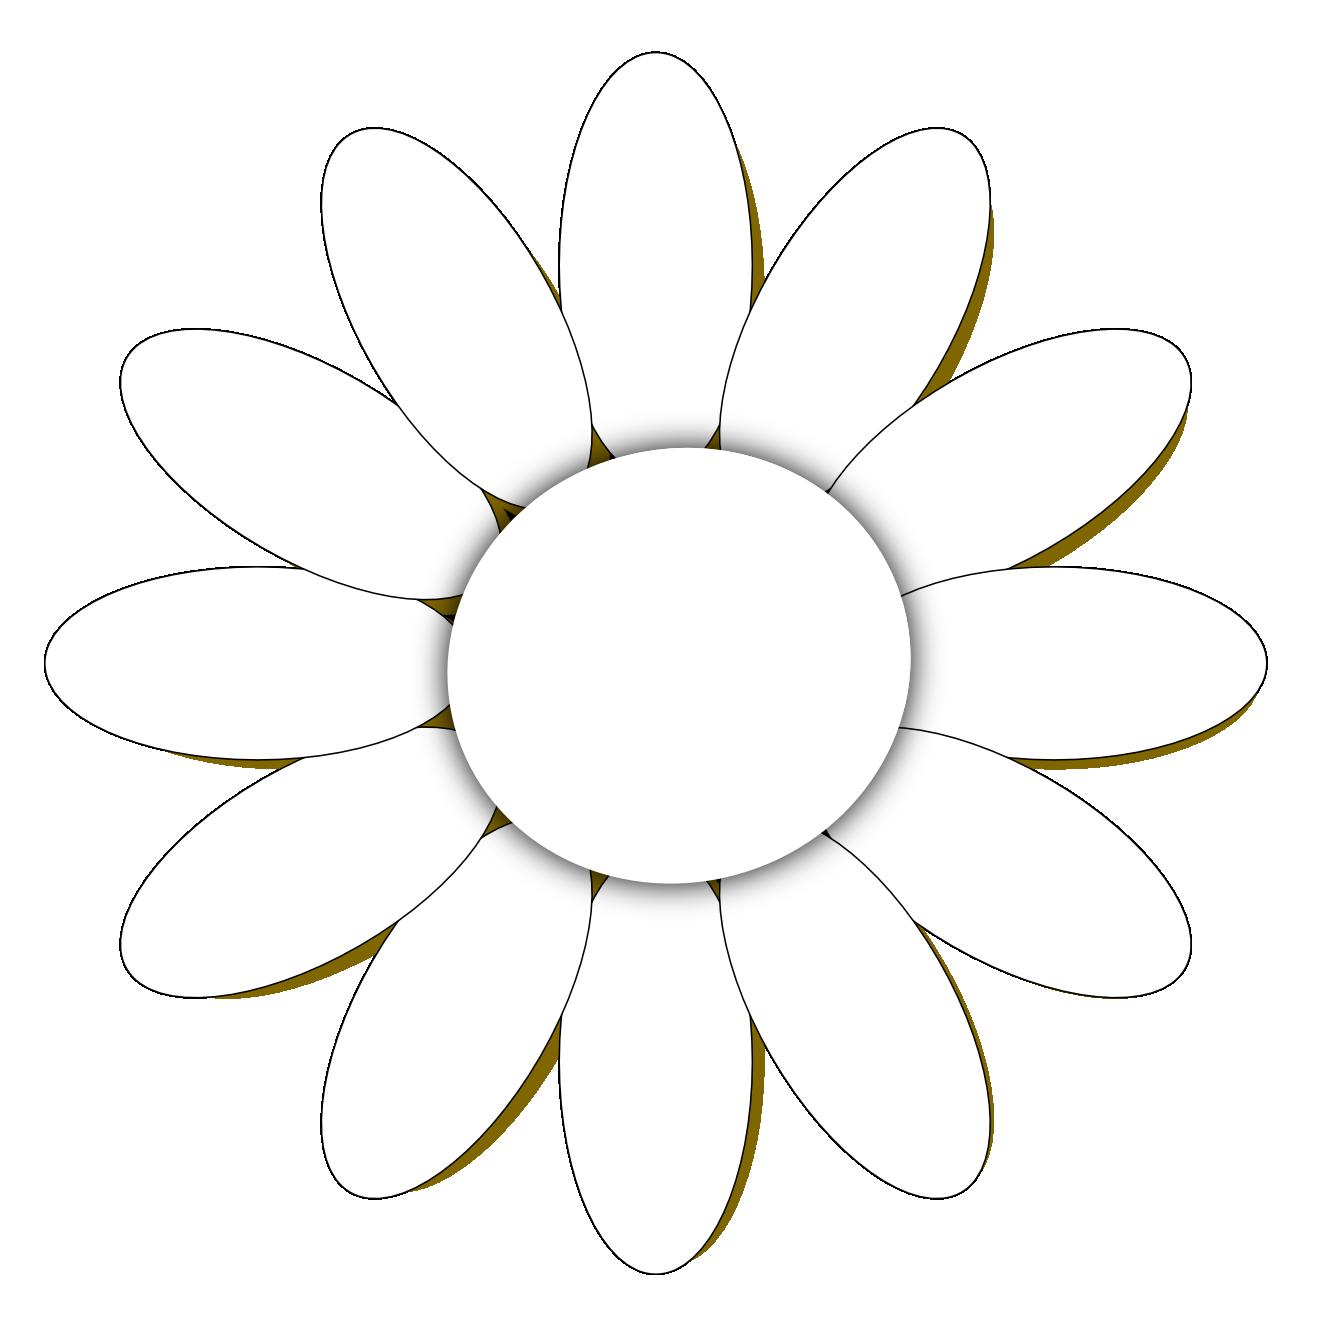 Annabella 67 Art Line Design : Daisy outline clipart best